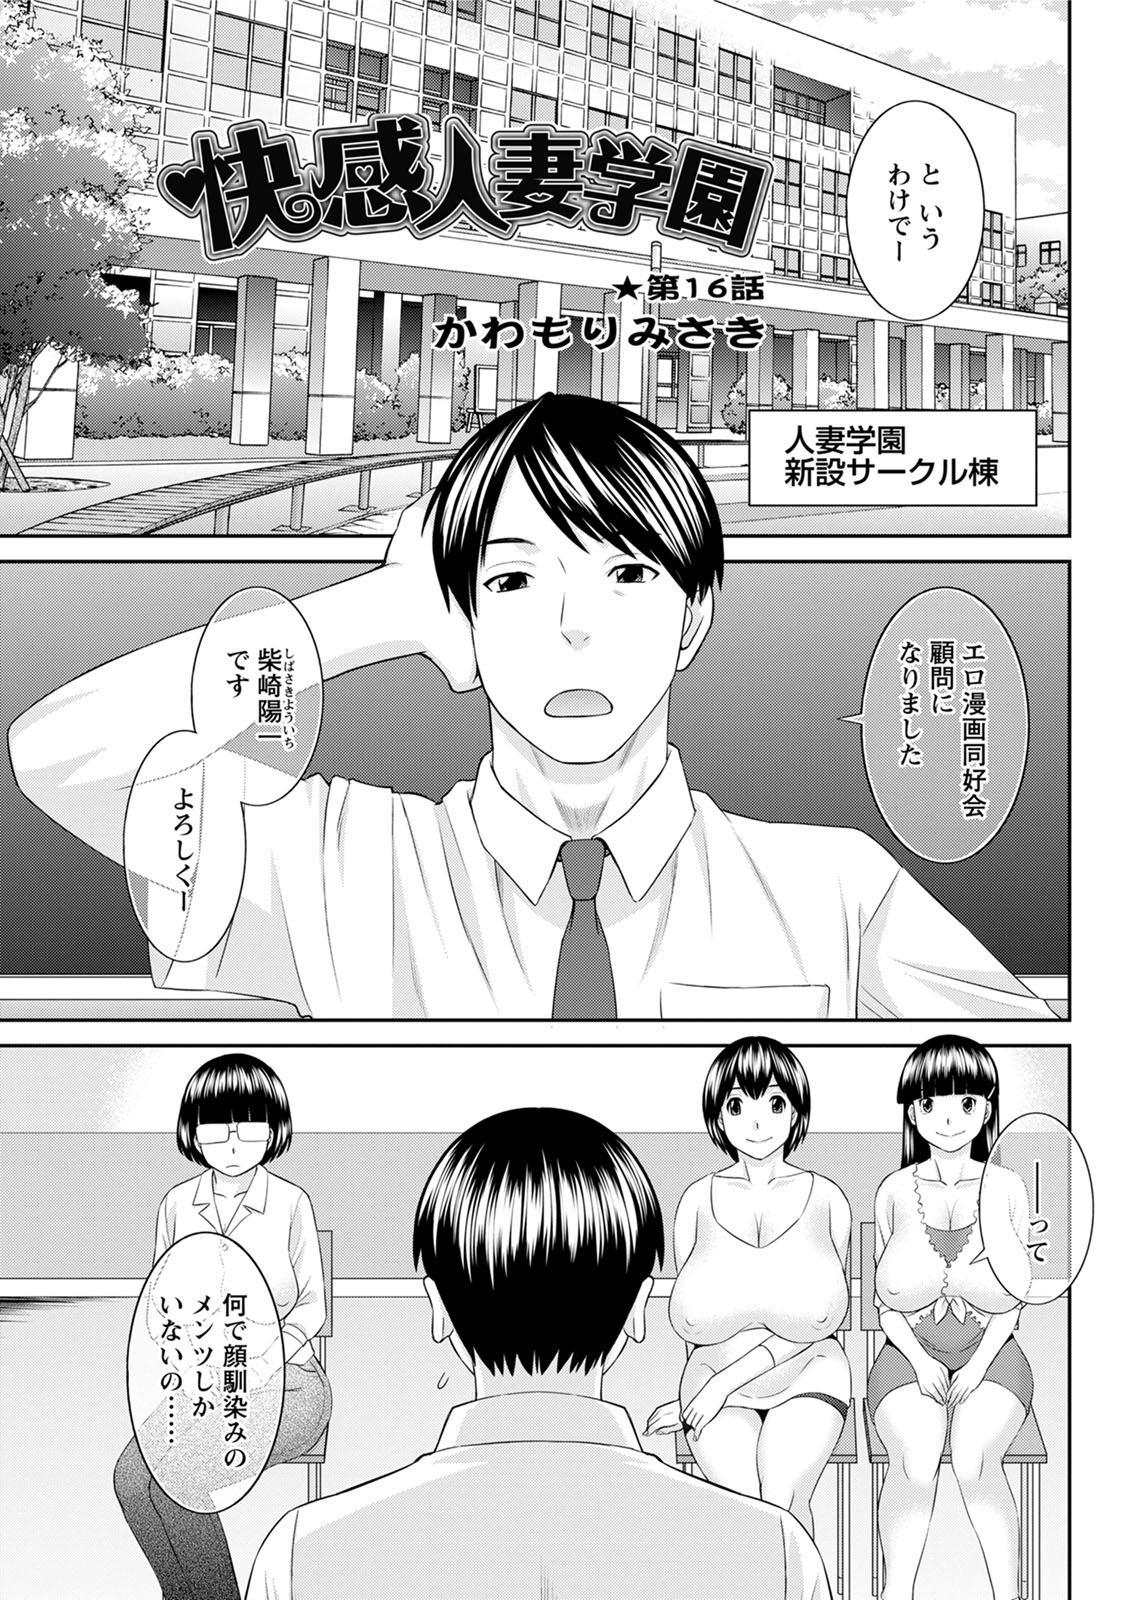 [Kawamori Misaki] Kaikan Hitotsuma Gakuen Ch. 1-6, 8-16 [Digital] 257